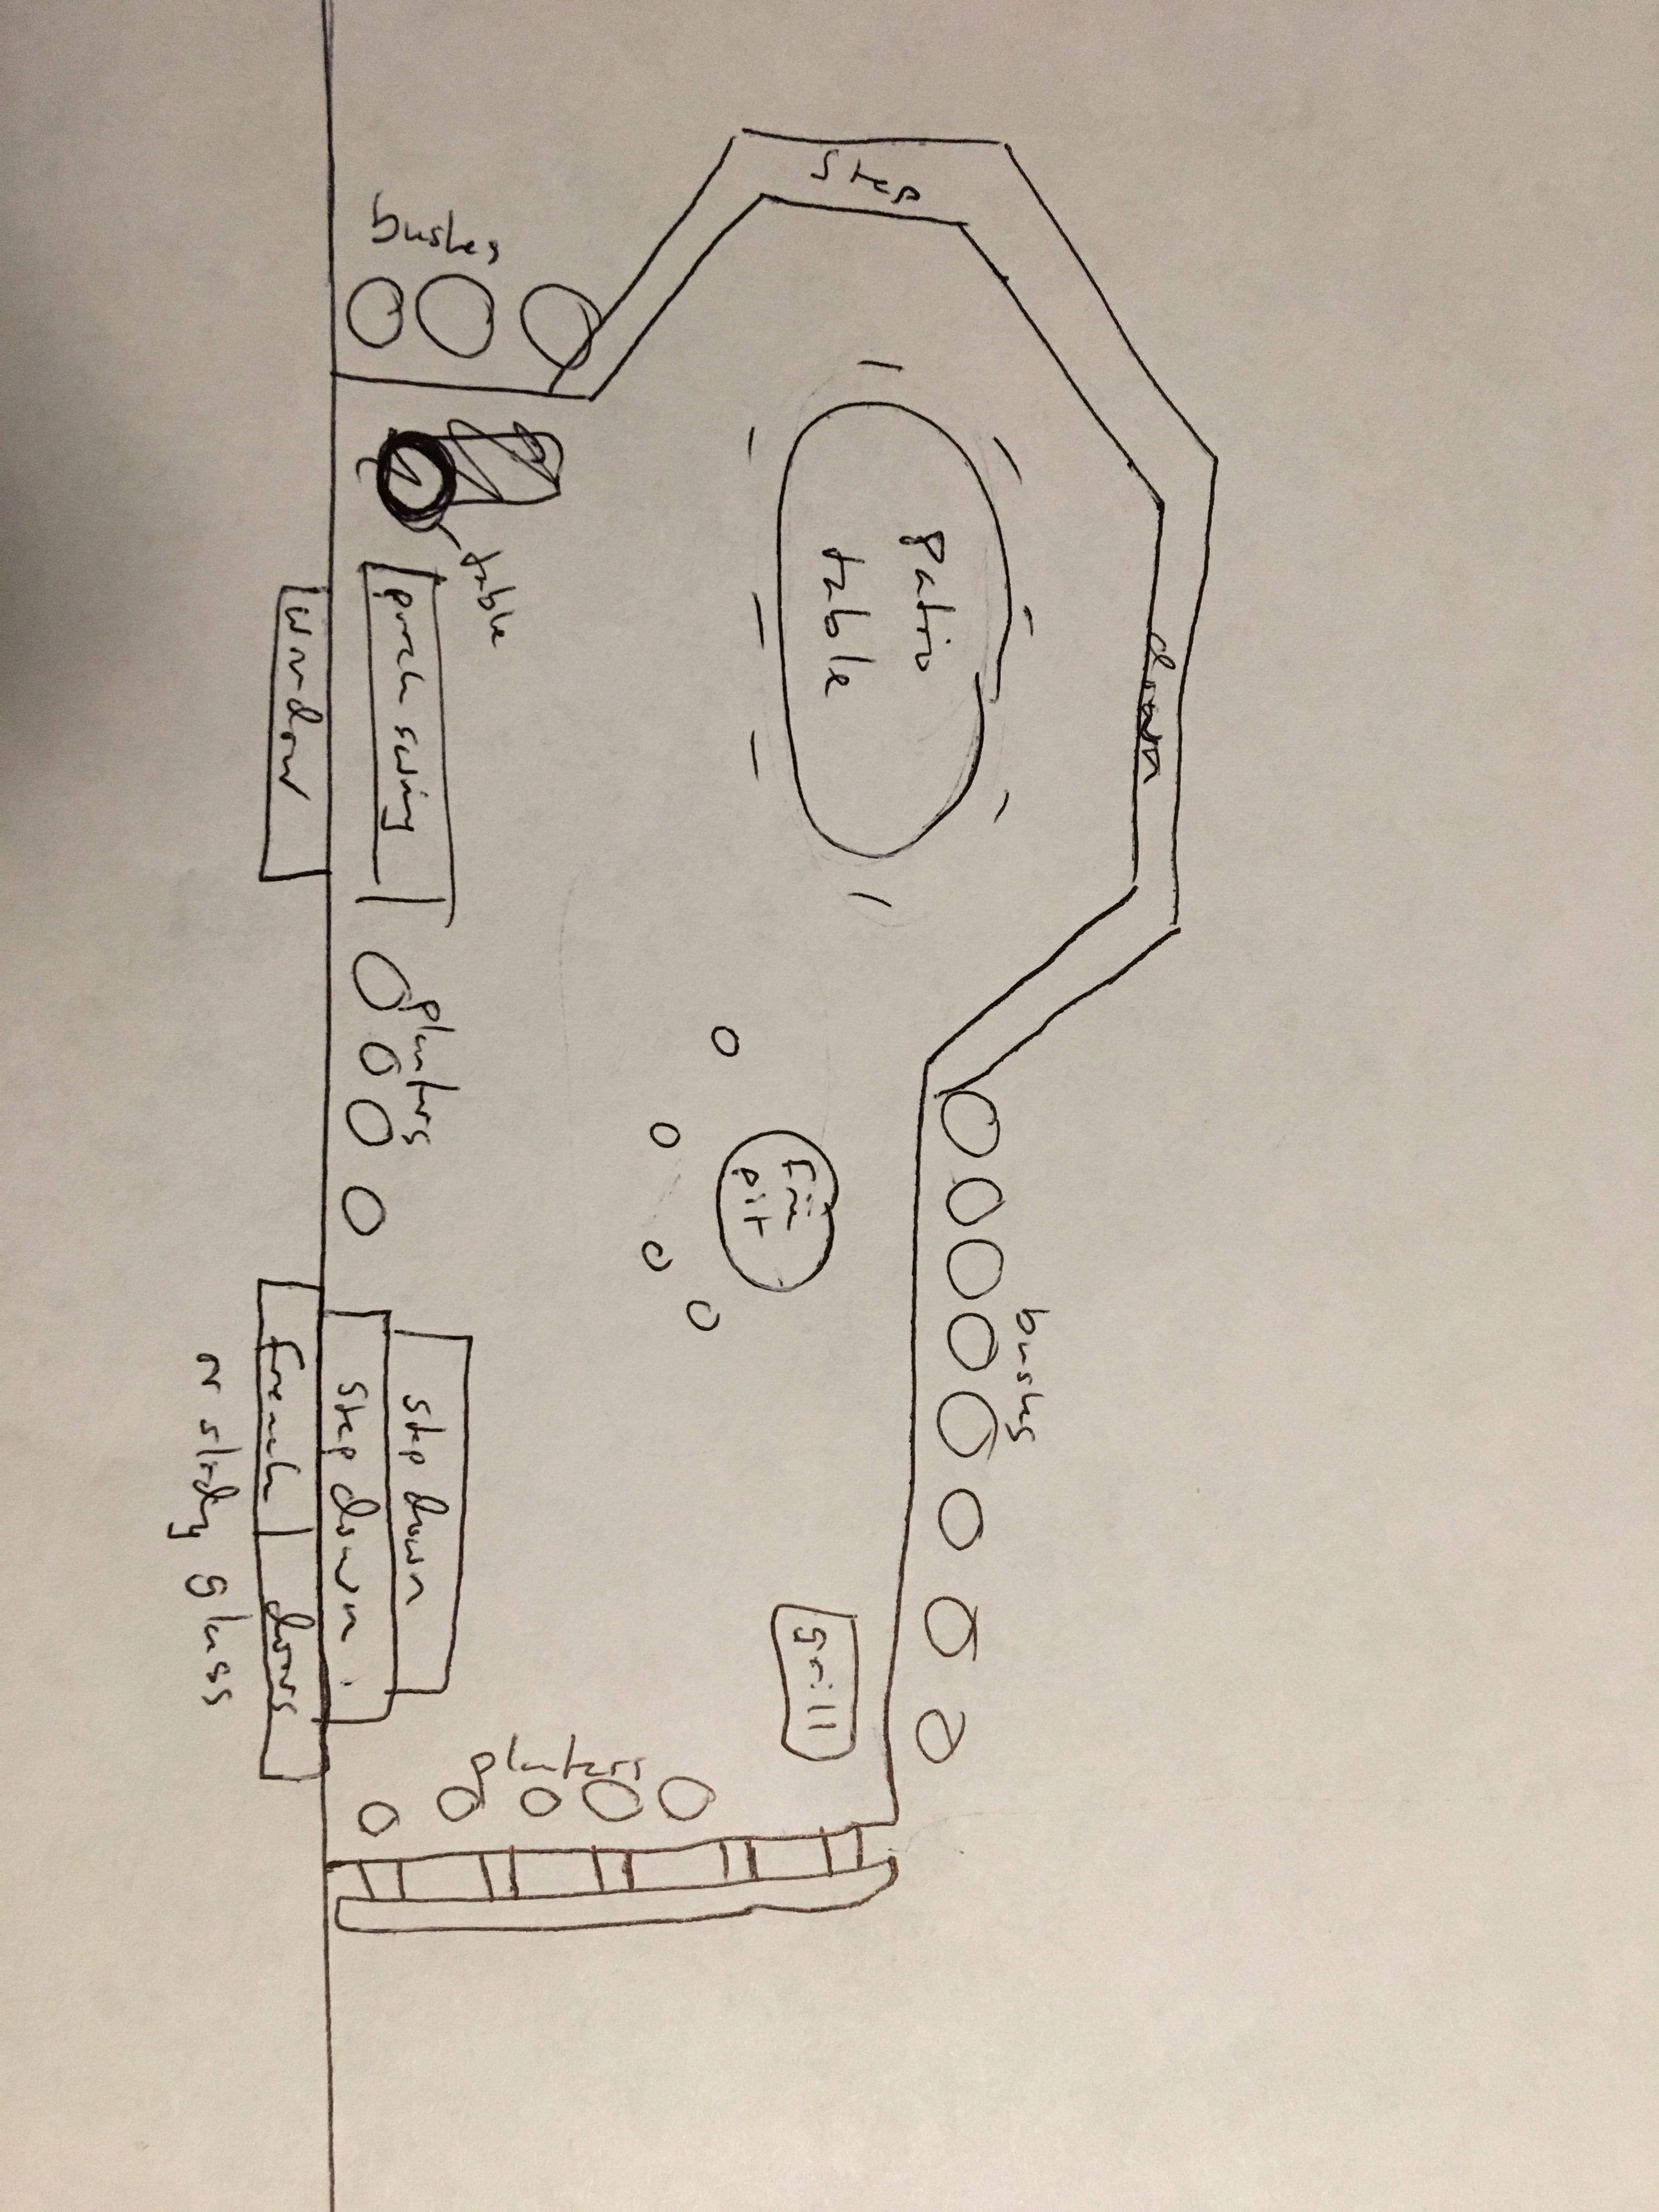 Patio Blueprint Blueprints Male Sketch Backyard